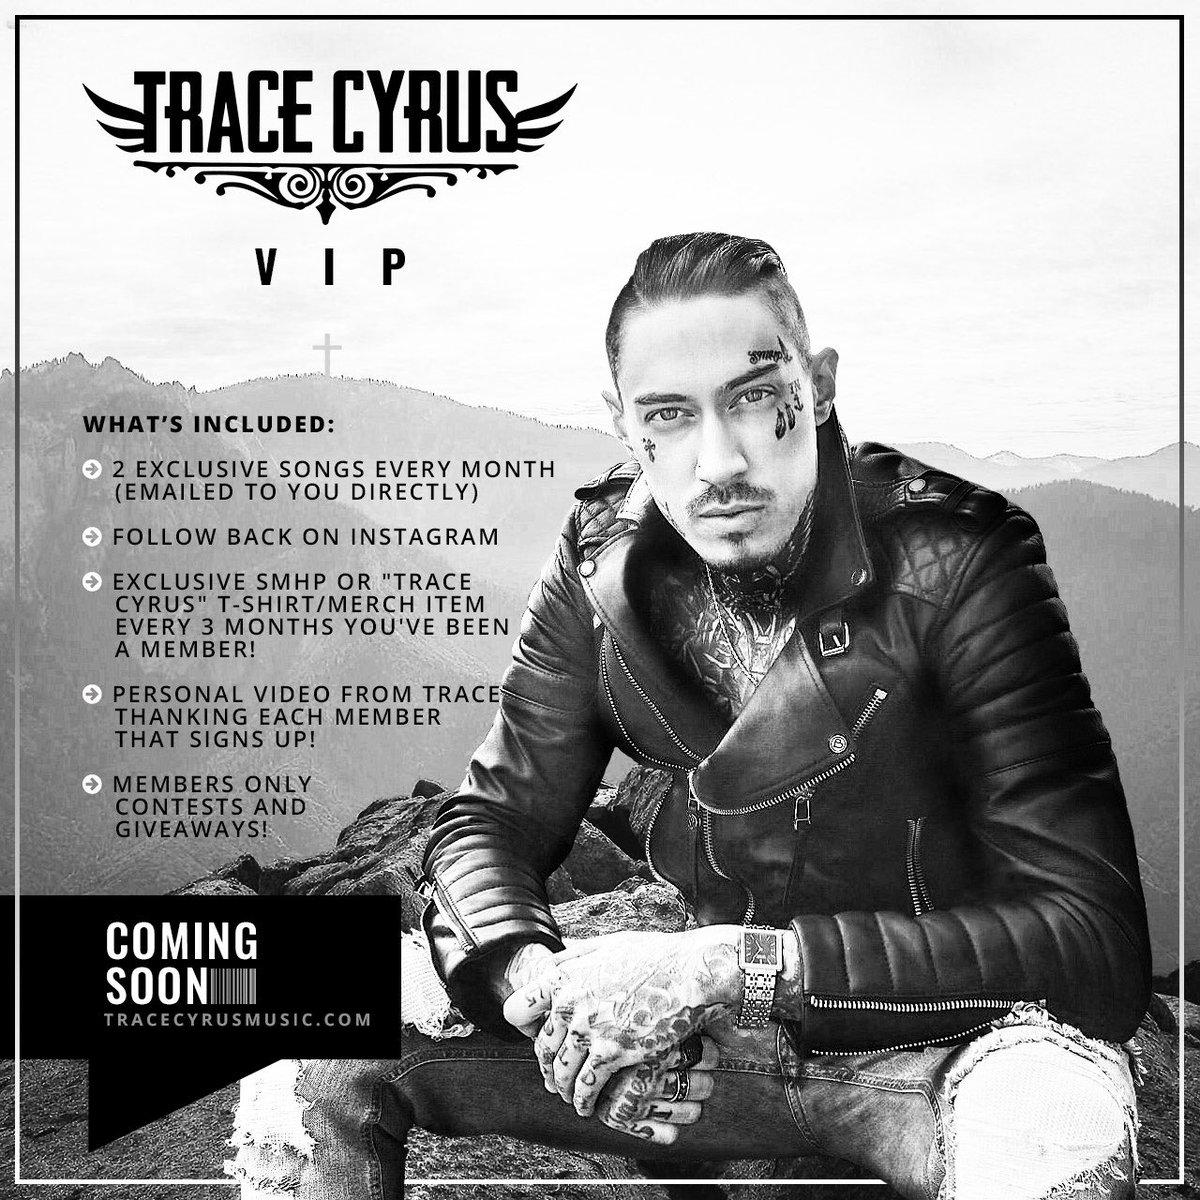 trace cyrus twitter